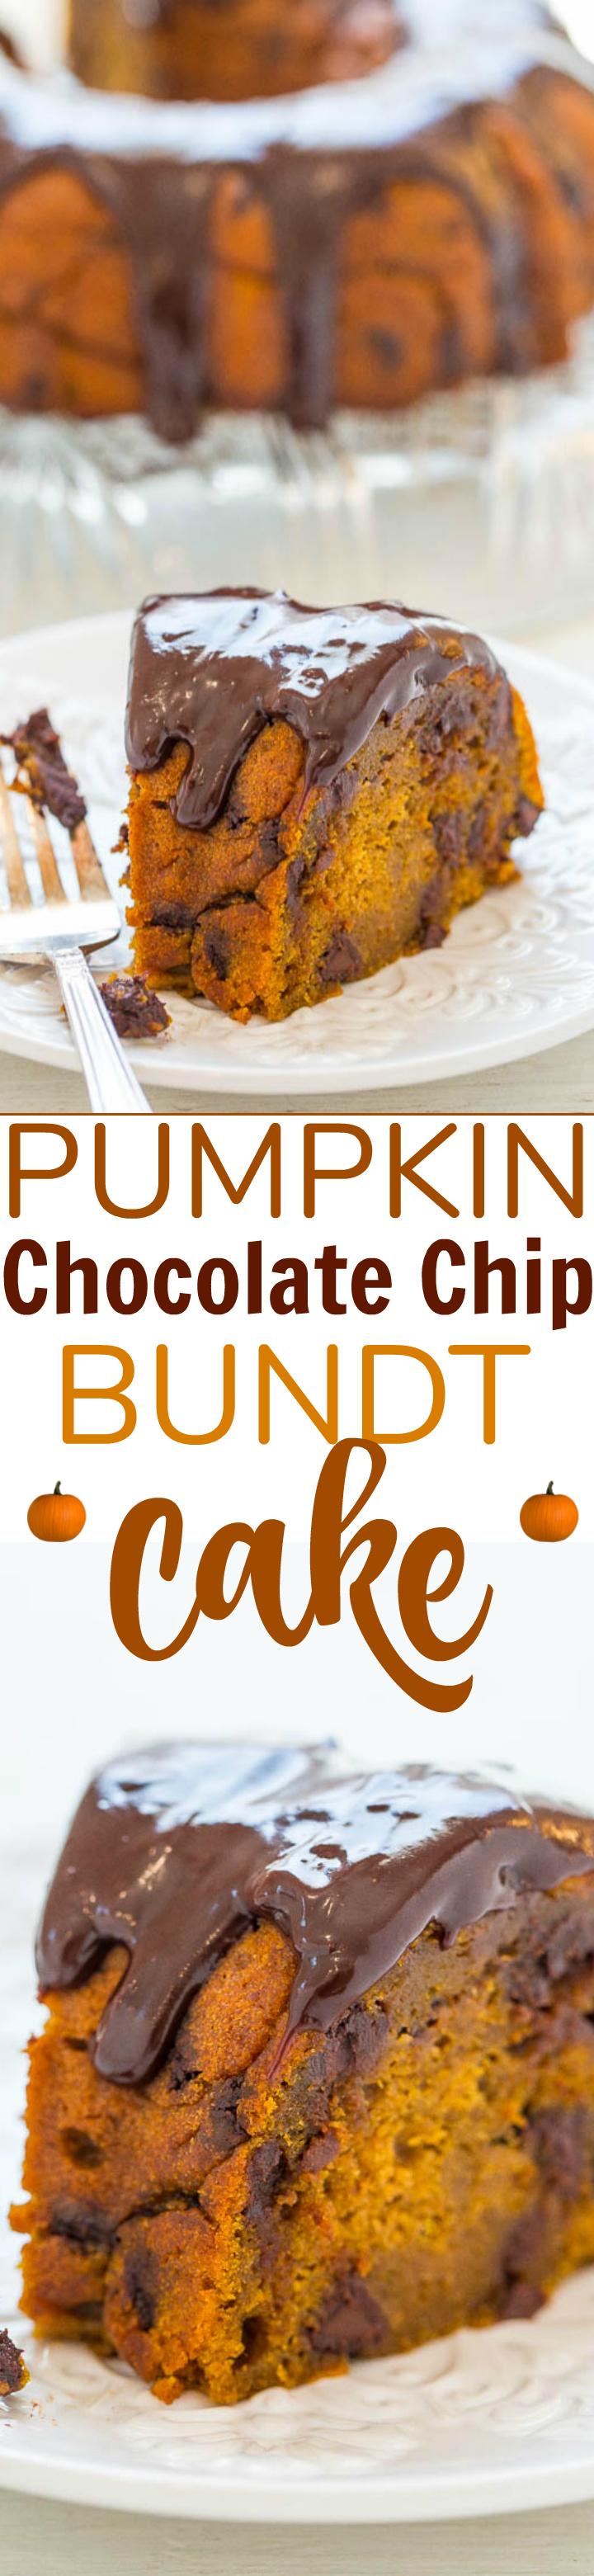 Pumpkin Chocolate Chip Bundt Cake With Chocolate Ganache